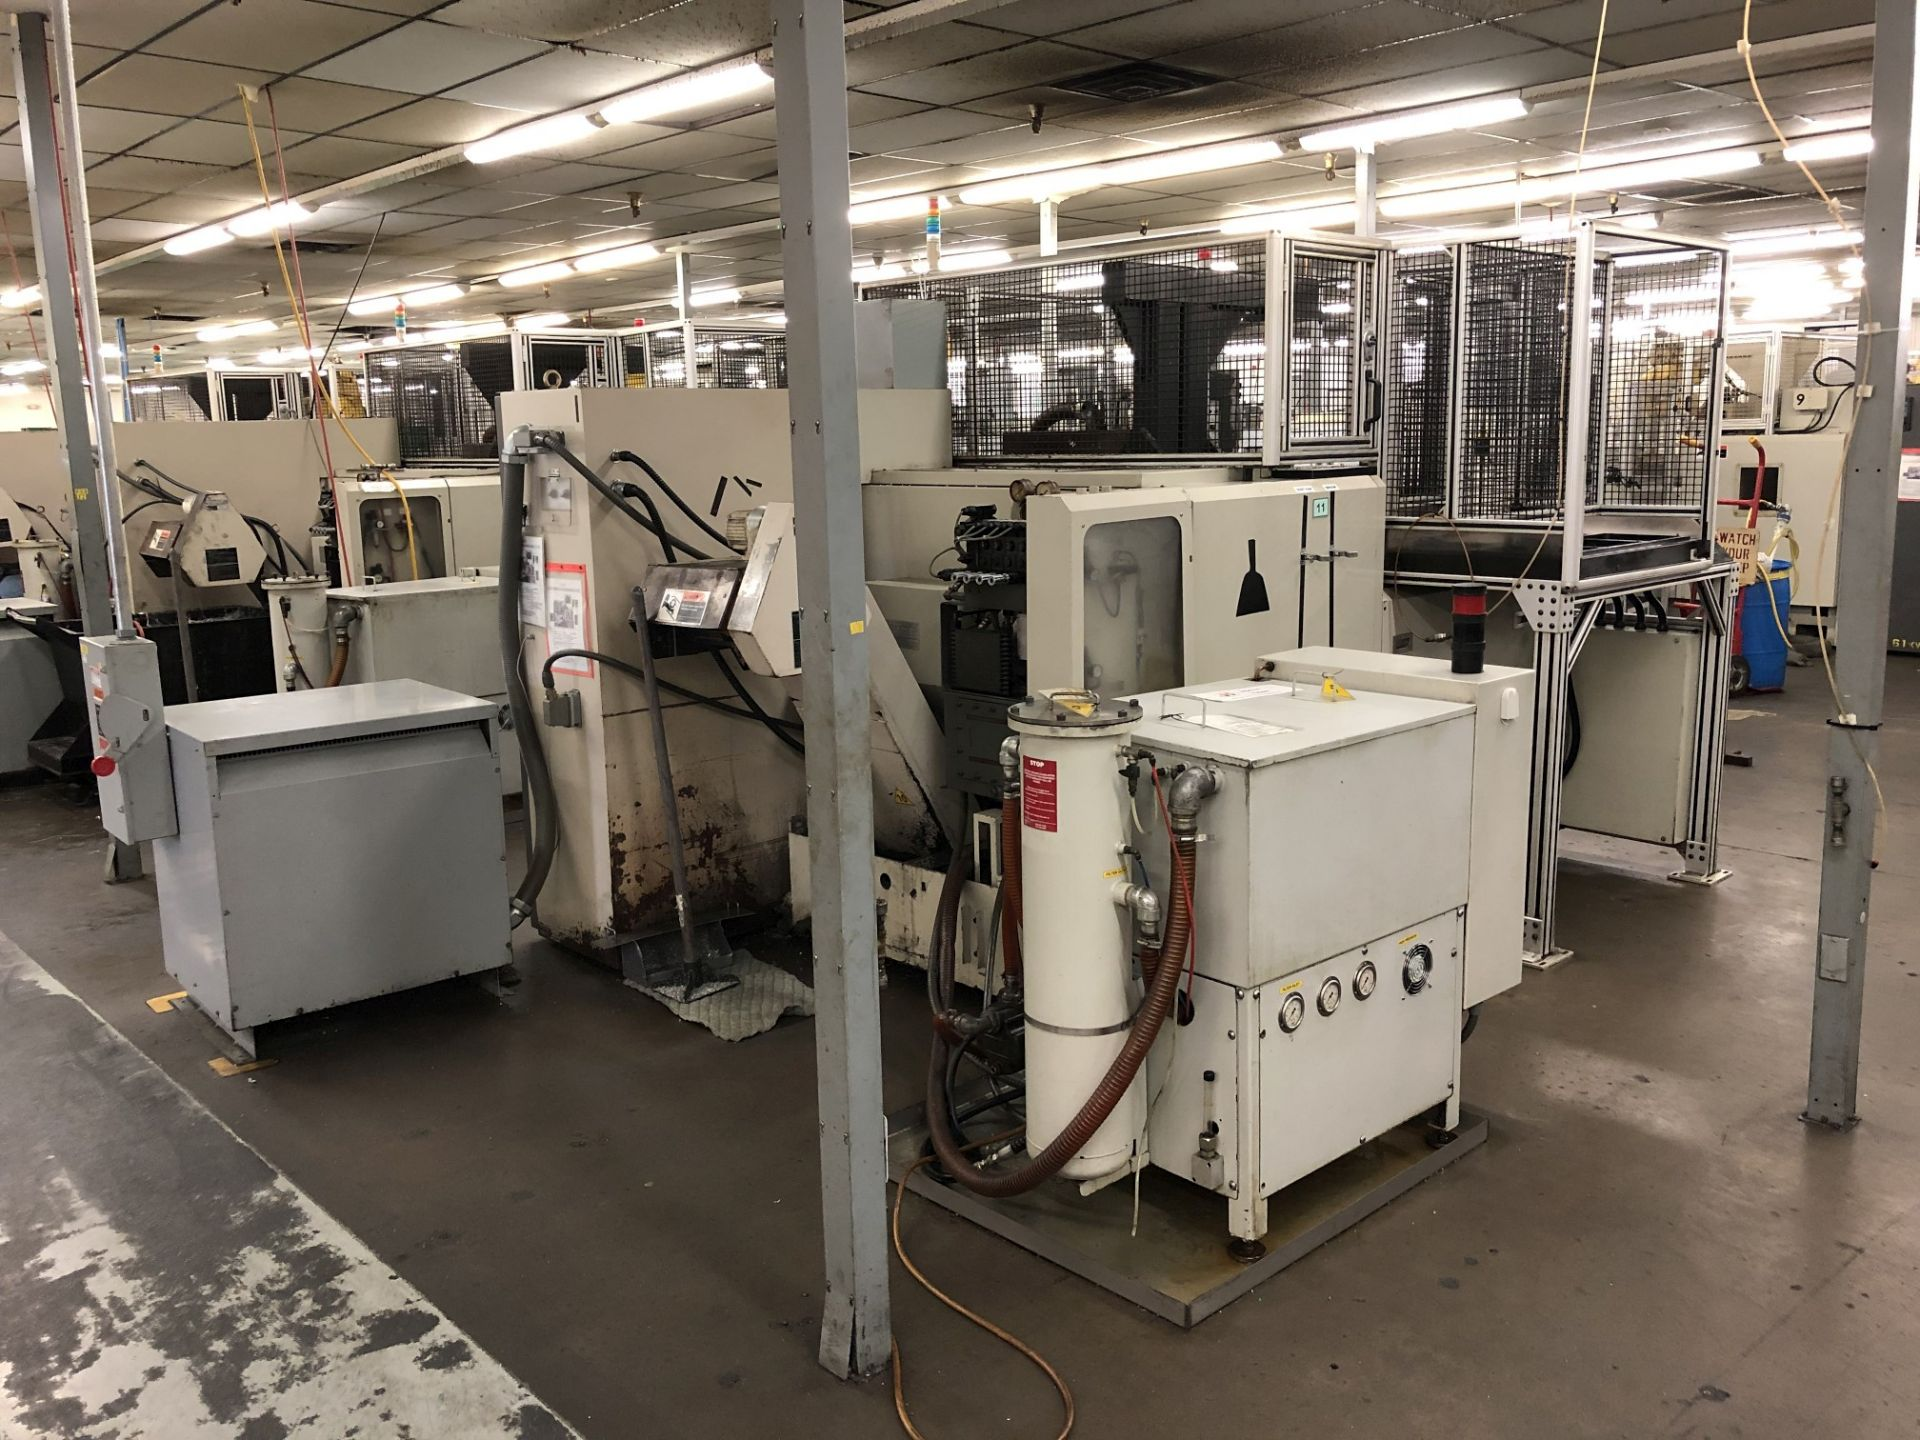 1999 Kitako MT4-200 Multi-Spindle CNC Turning Mill - Image 9 of 16